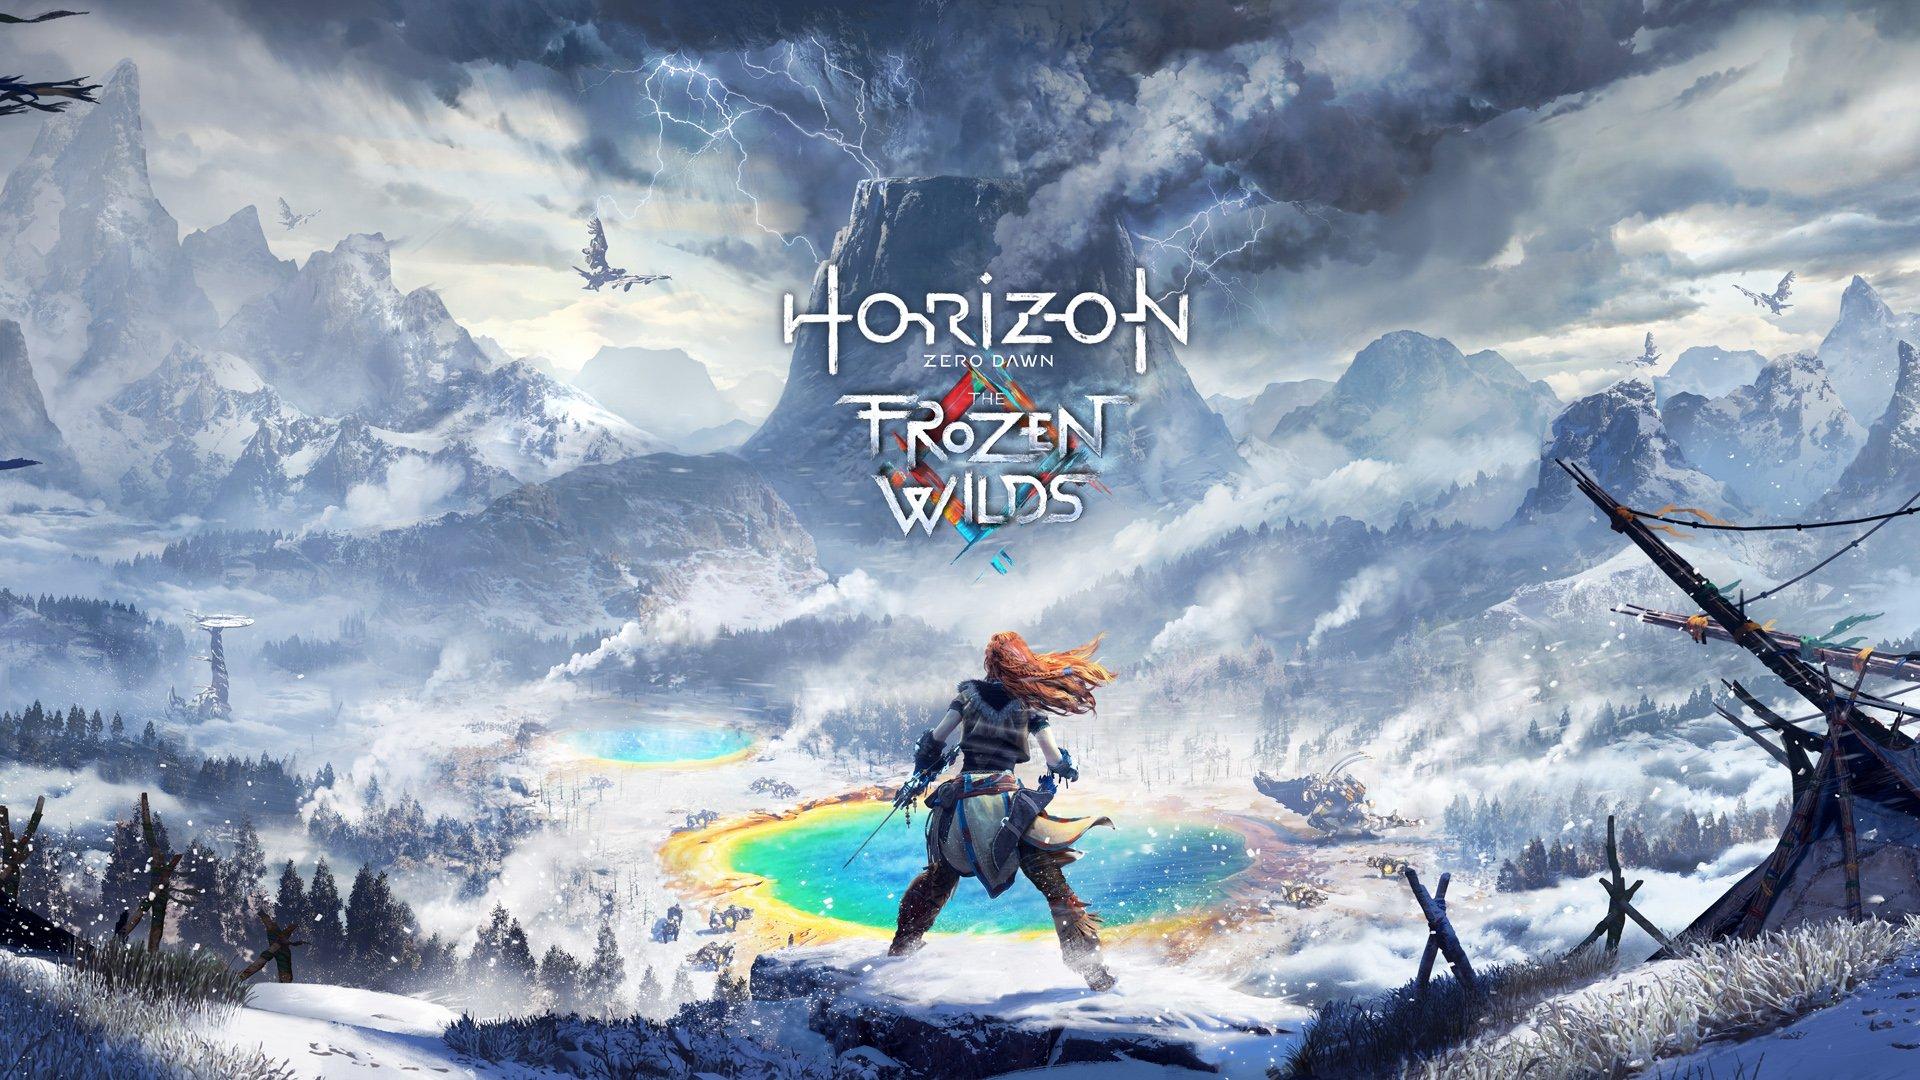 Horizon Zero Dawn The Frozen Wilds-Review-GamersRD